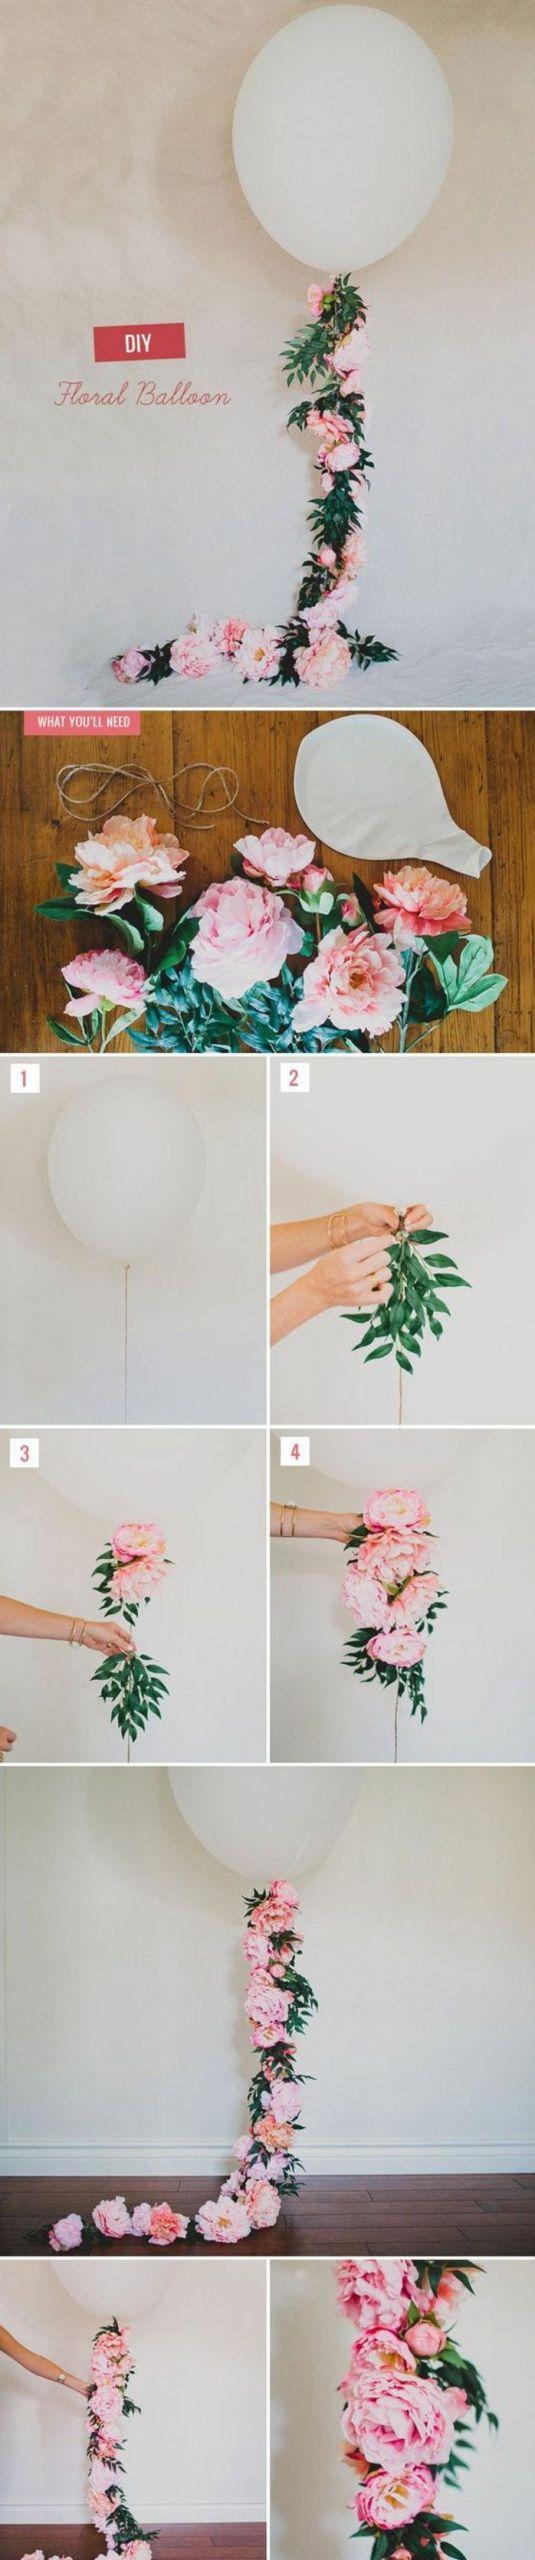 basteln fr C3 BChling balon rosen blumen fr C3 BChlingsdeko selber machen diy party deko e